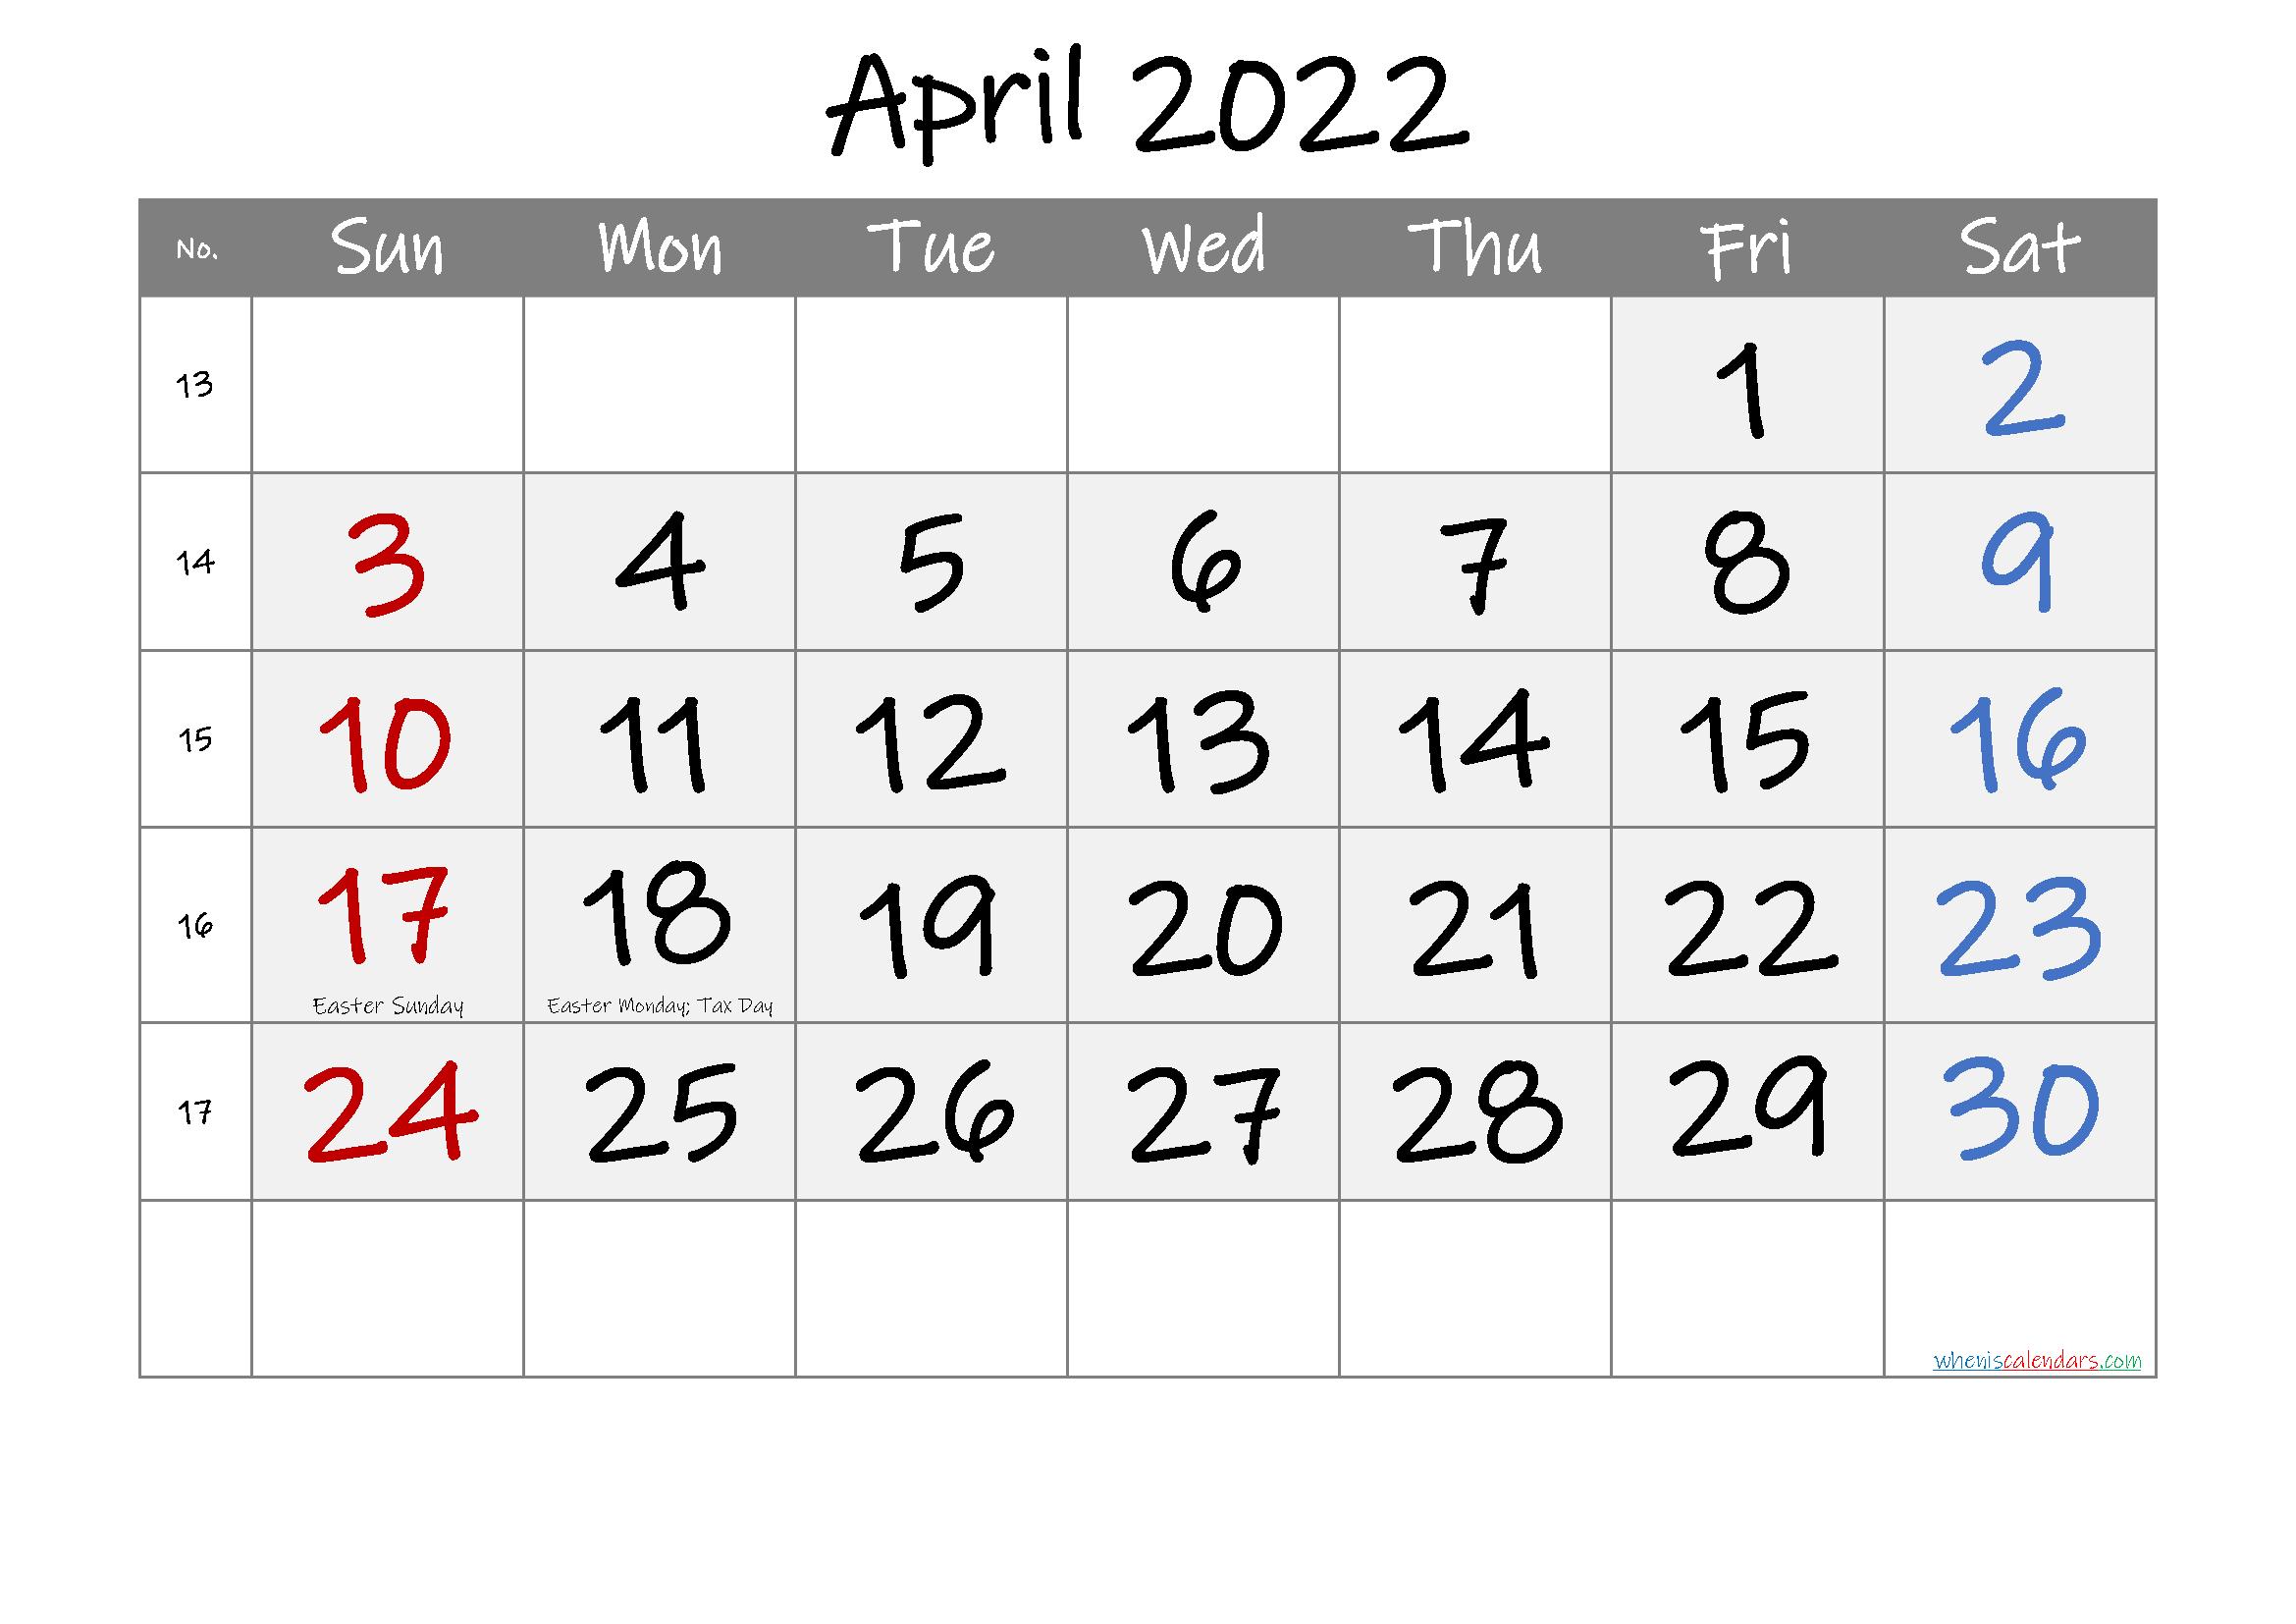 Free Printable April 2021 Calendar With Holidays within Printable Calendar April 2022 Free Photo